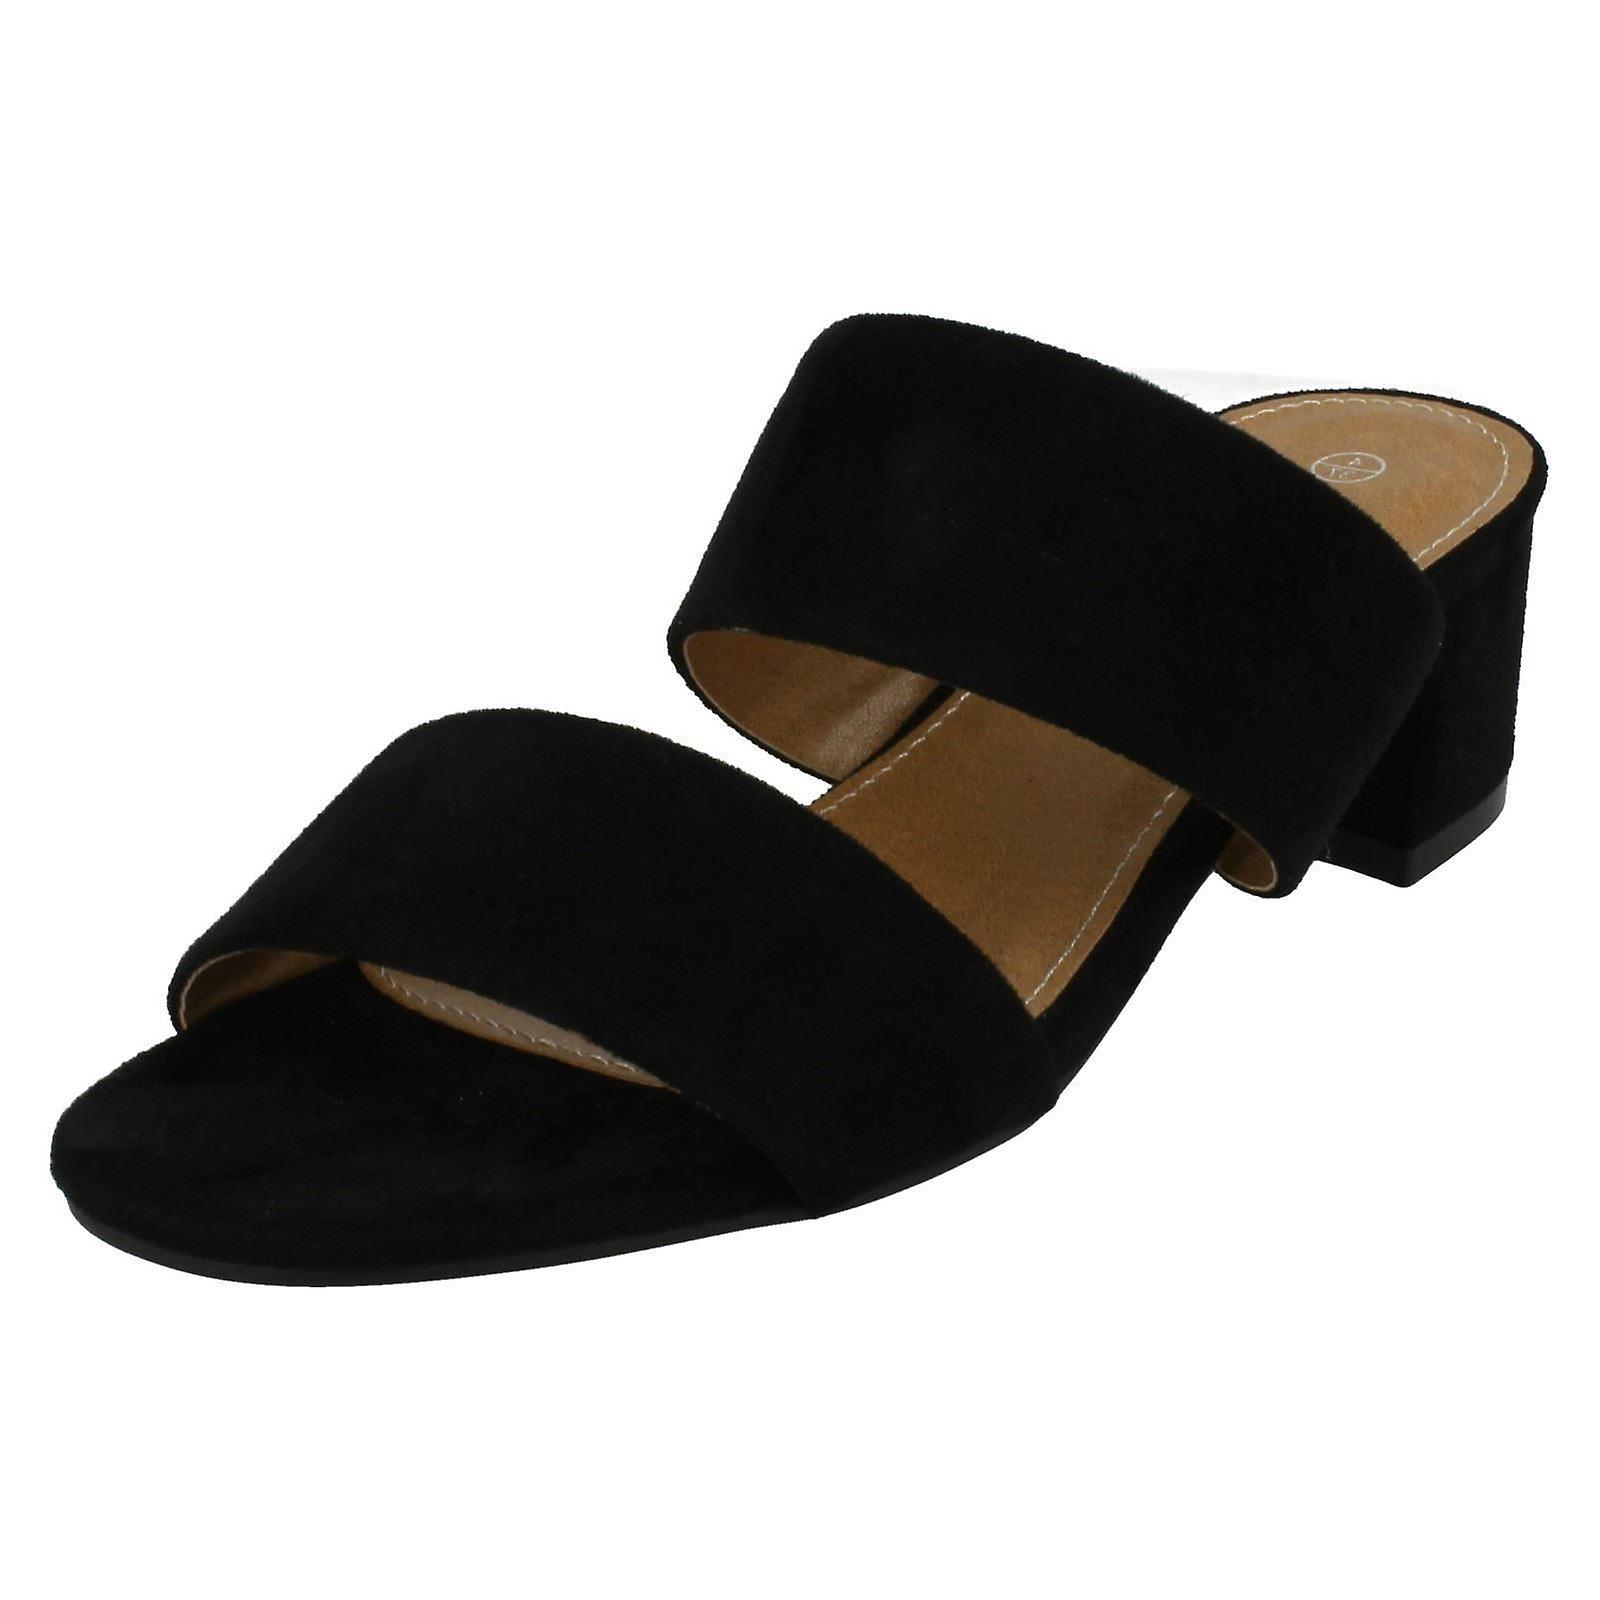 Ladies Anne Michelle Mid Heel Mule Strap Sandals F10627